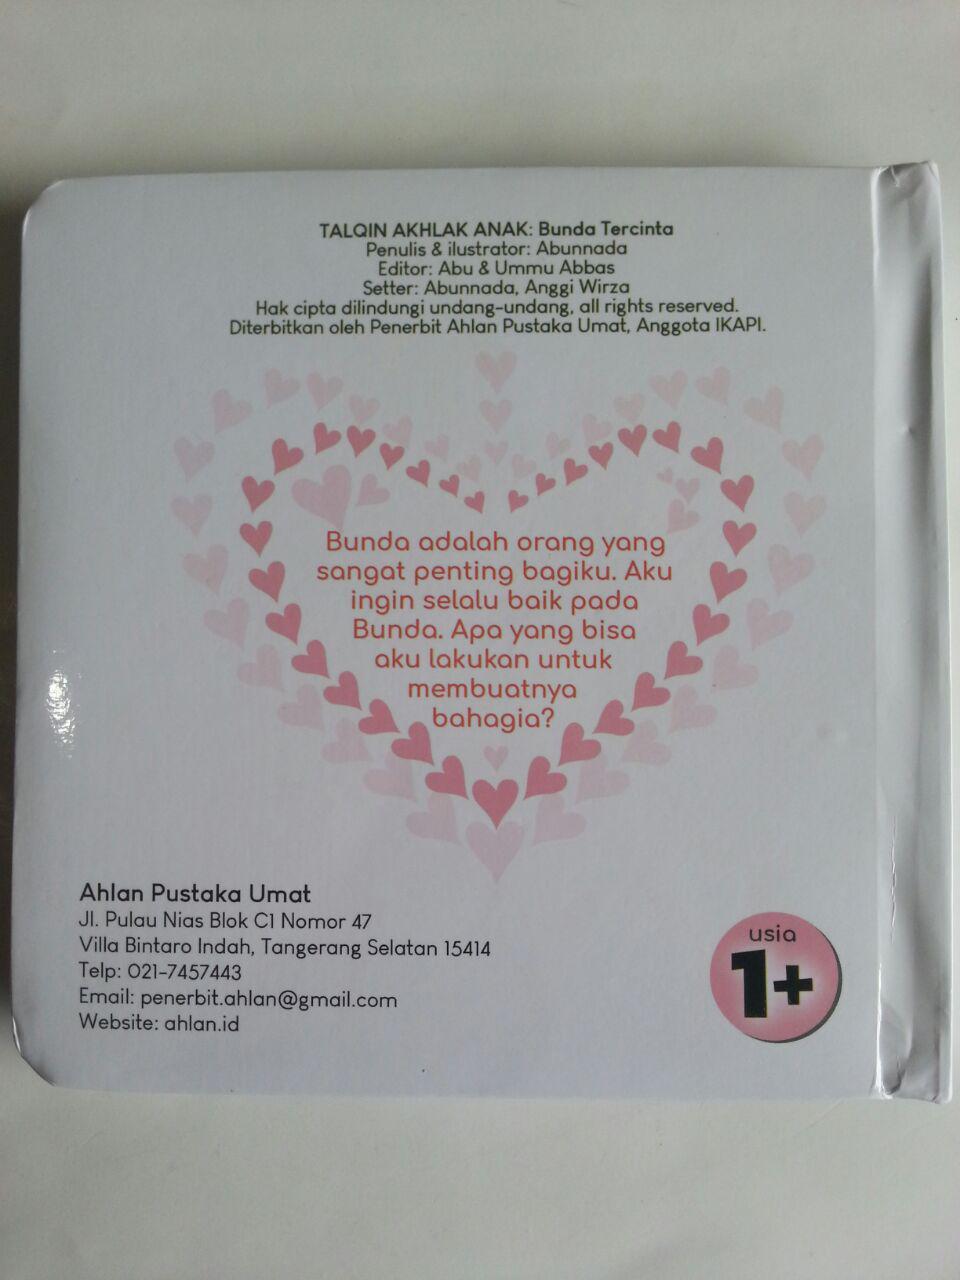 Buku Anak Talqin Akhlak Anak Bunda Tercinta cover